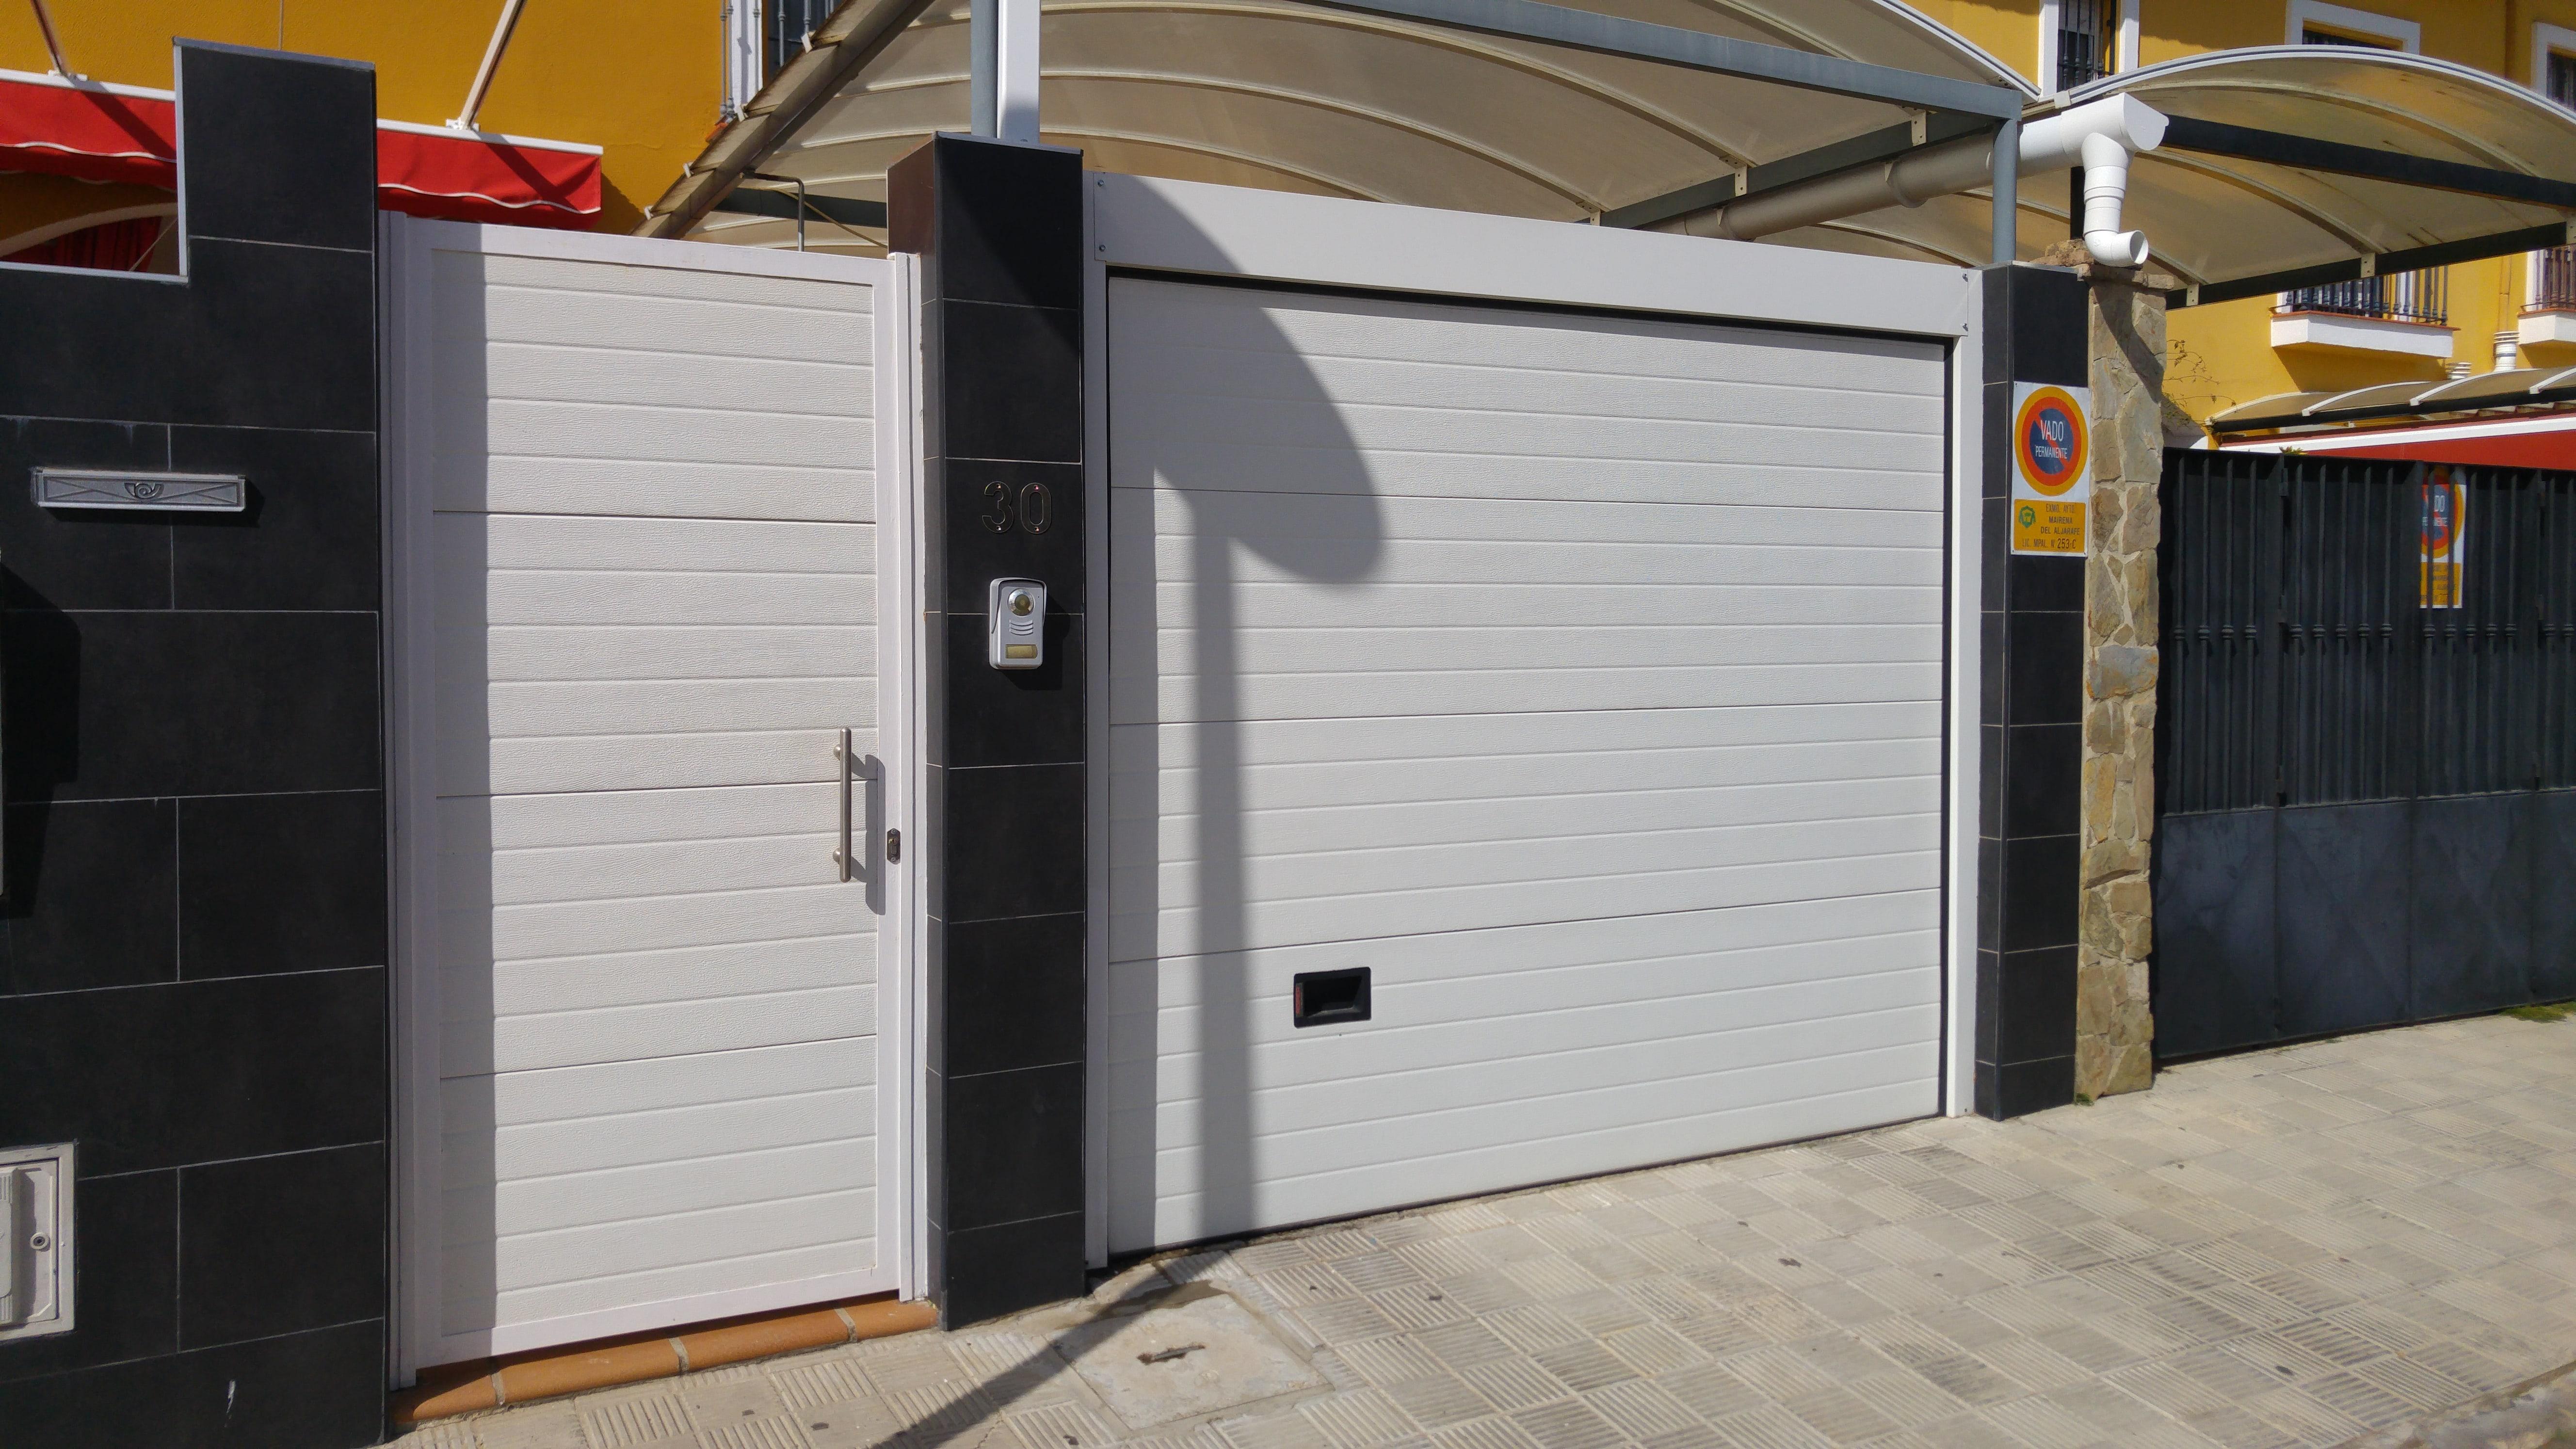 Puertas autom ticas peatonales puertas automaticas mena for Puertas automaticas garaje